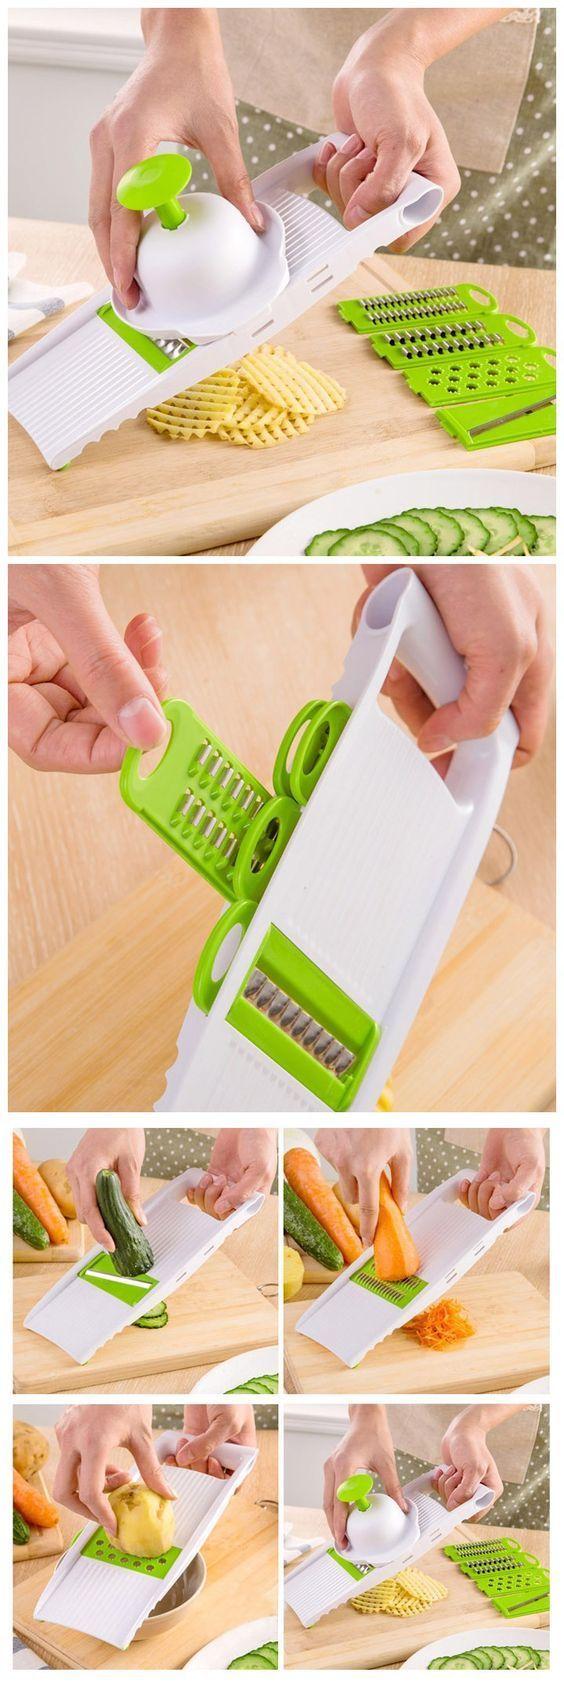 Practical Fruit Vegetable Cutter Kit // 5PCS